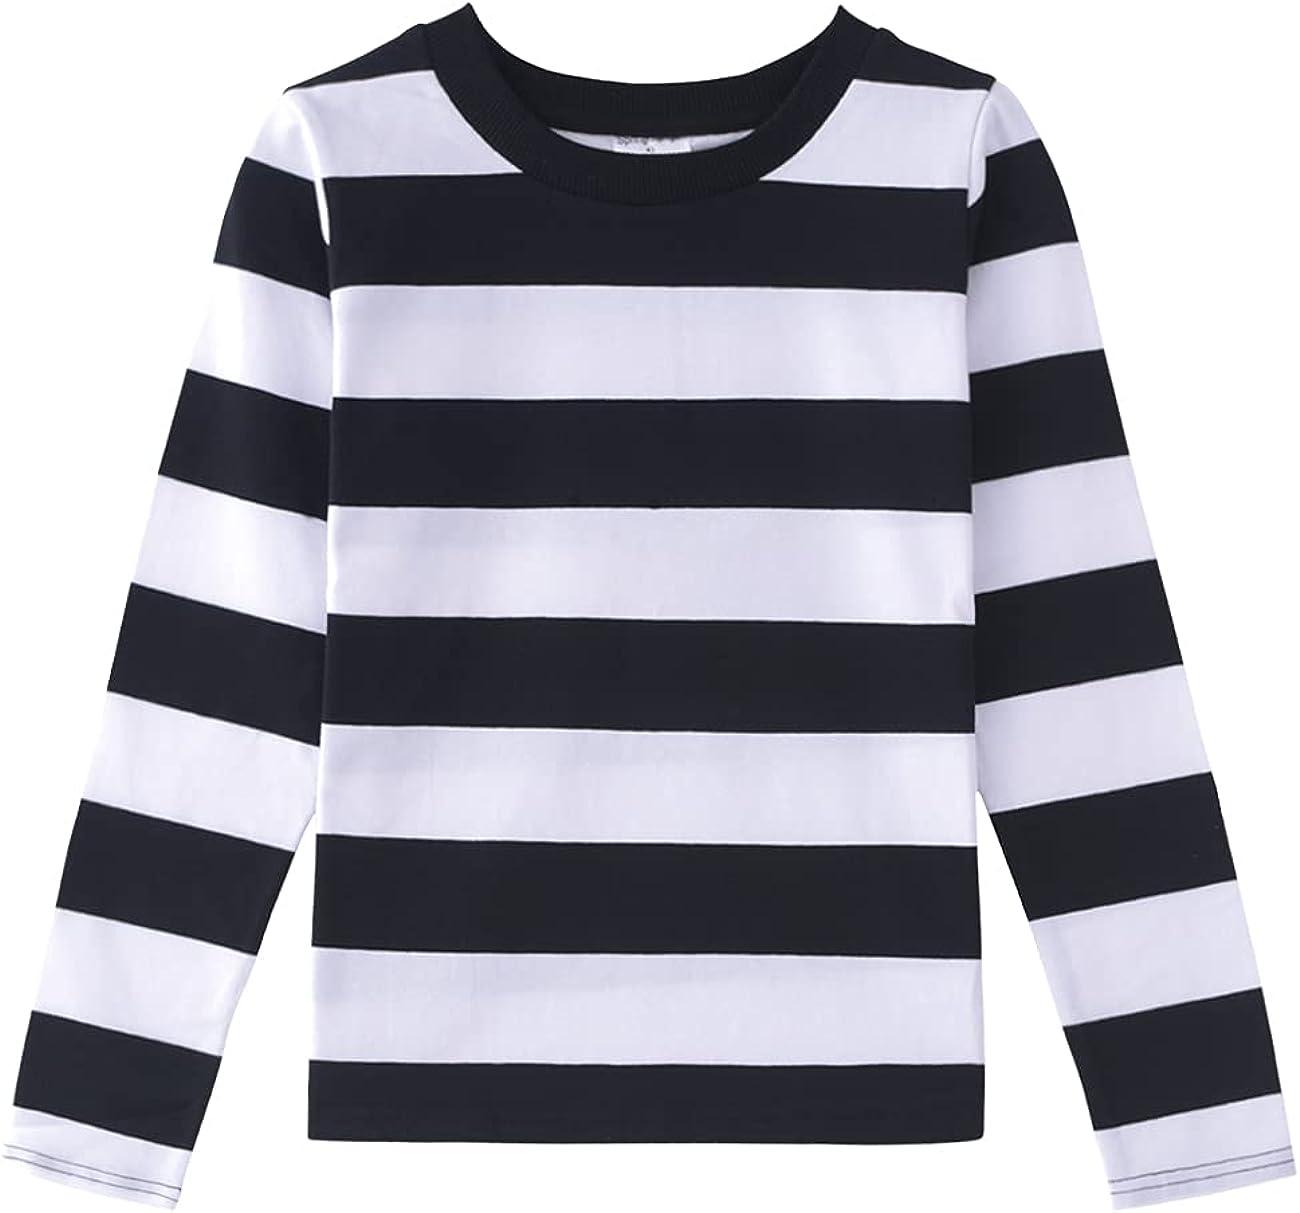 Spring&Gege Boys' Long Sleeve Striped Crew Neck T-Shirt